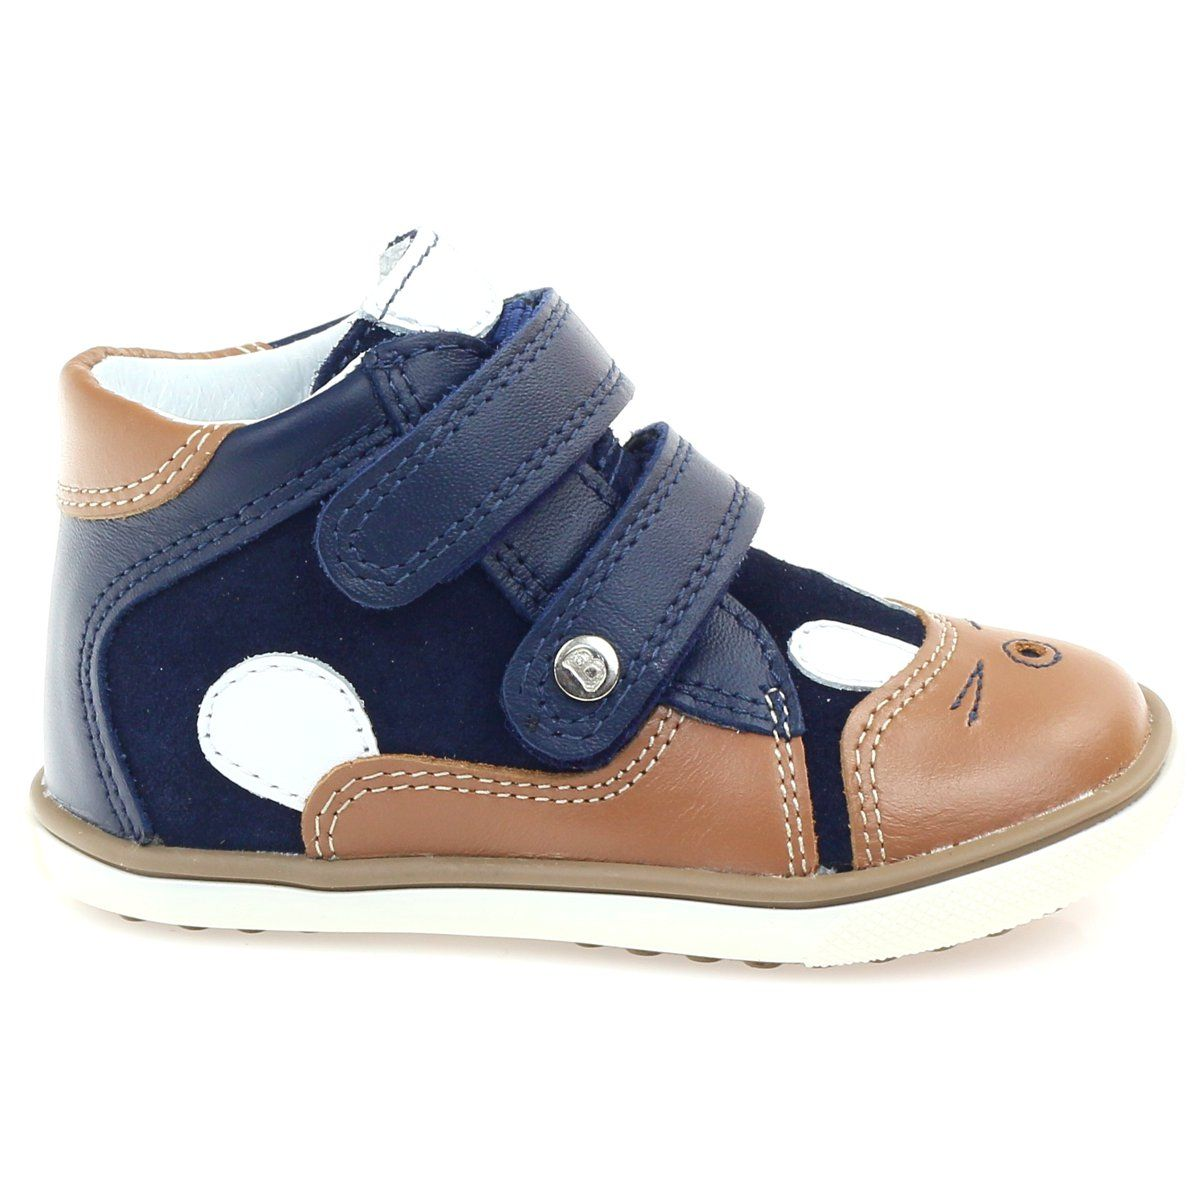 Trzewiki Chlopiece Krolik Bartek 11702 Braz Granatowe Brazowe Biale High Top Sneakers Baby Shoes Shoes